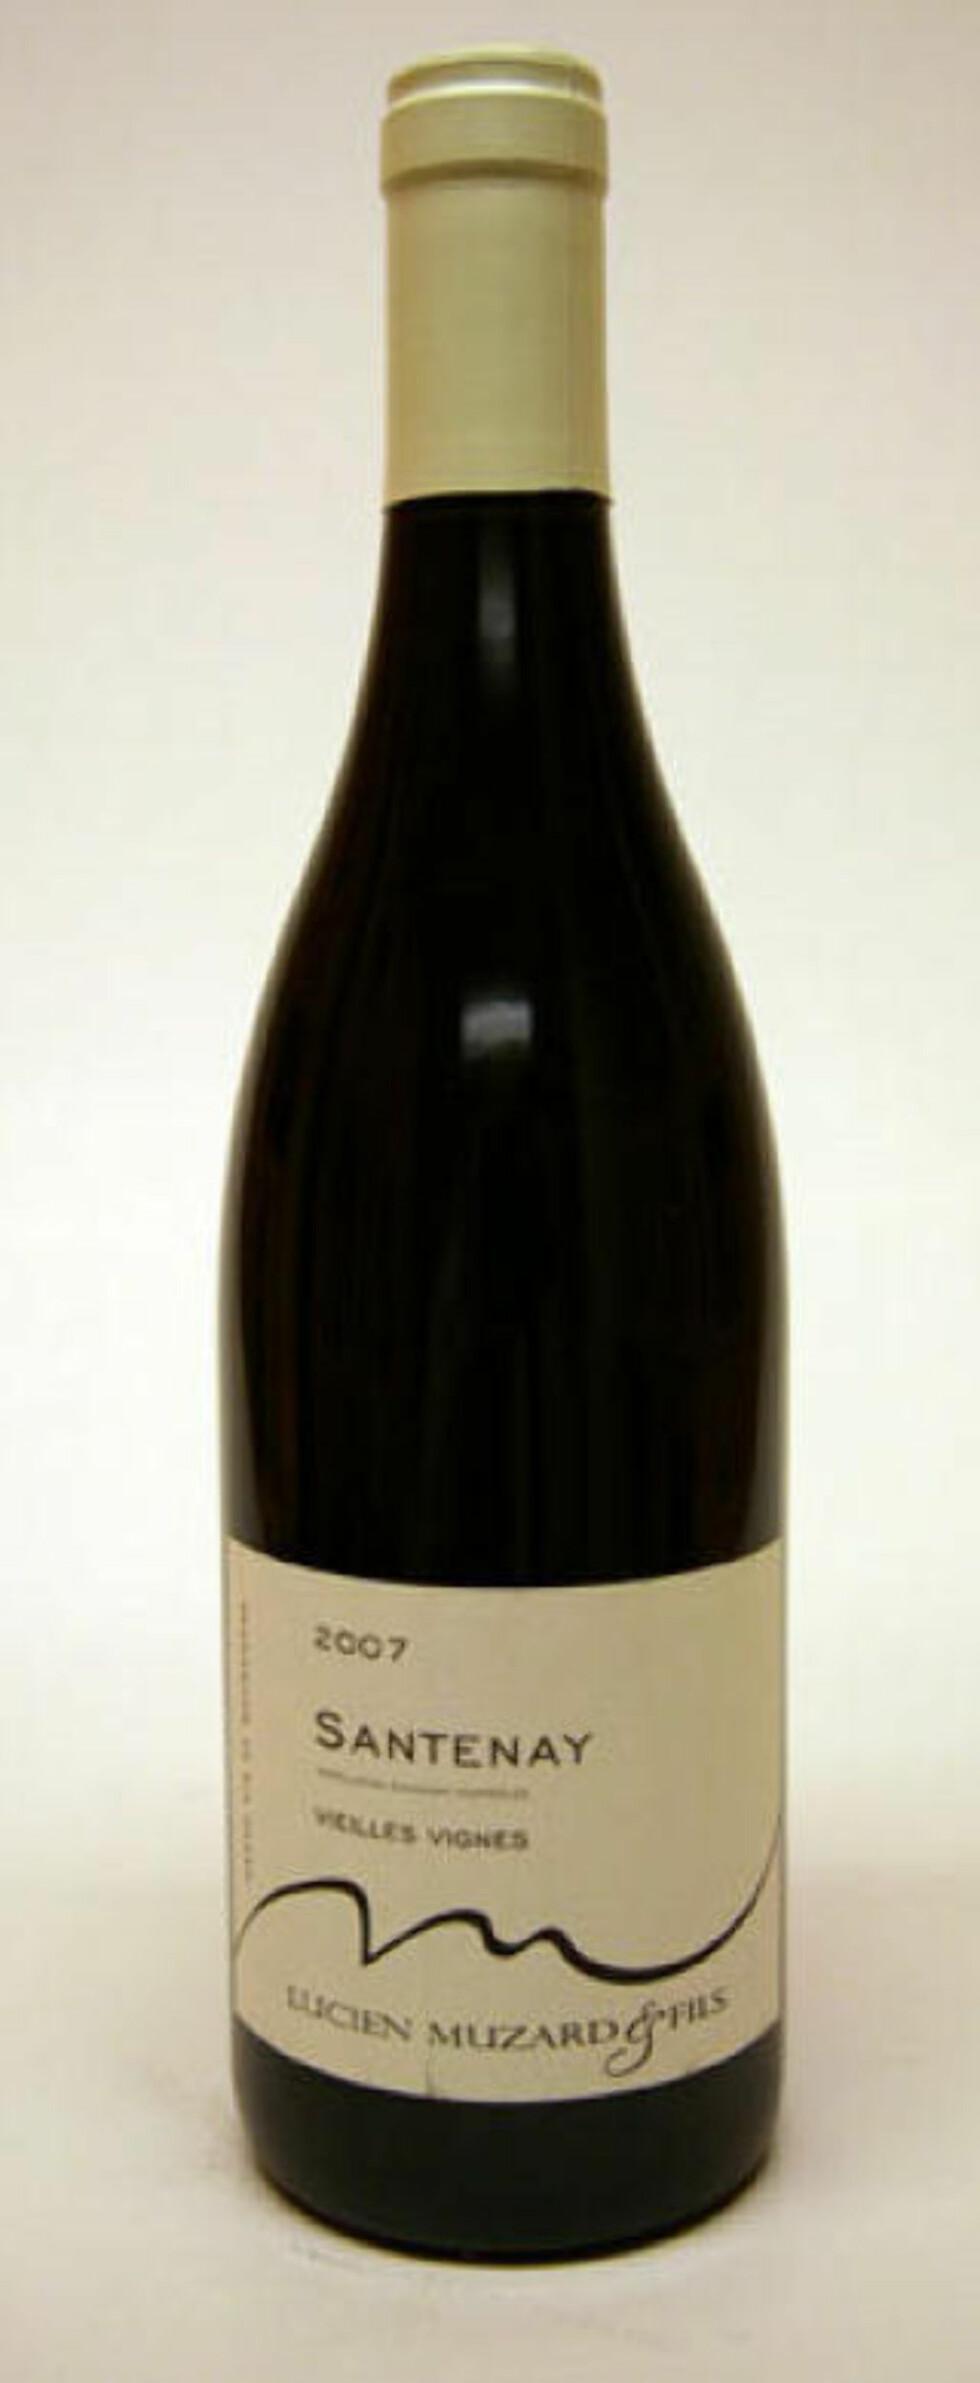 PRISGUNSTIG: Burgunderen Santenay Vieilles Vignes 2008 får en femmer.